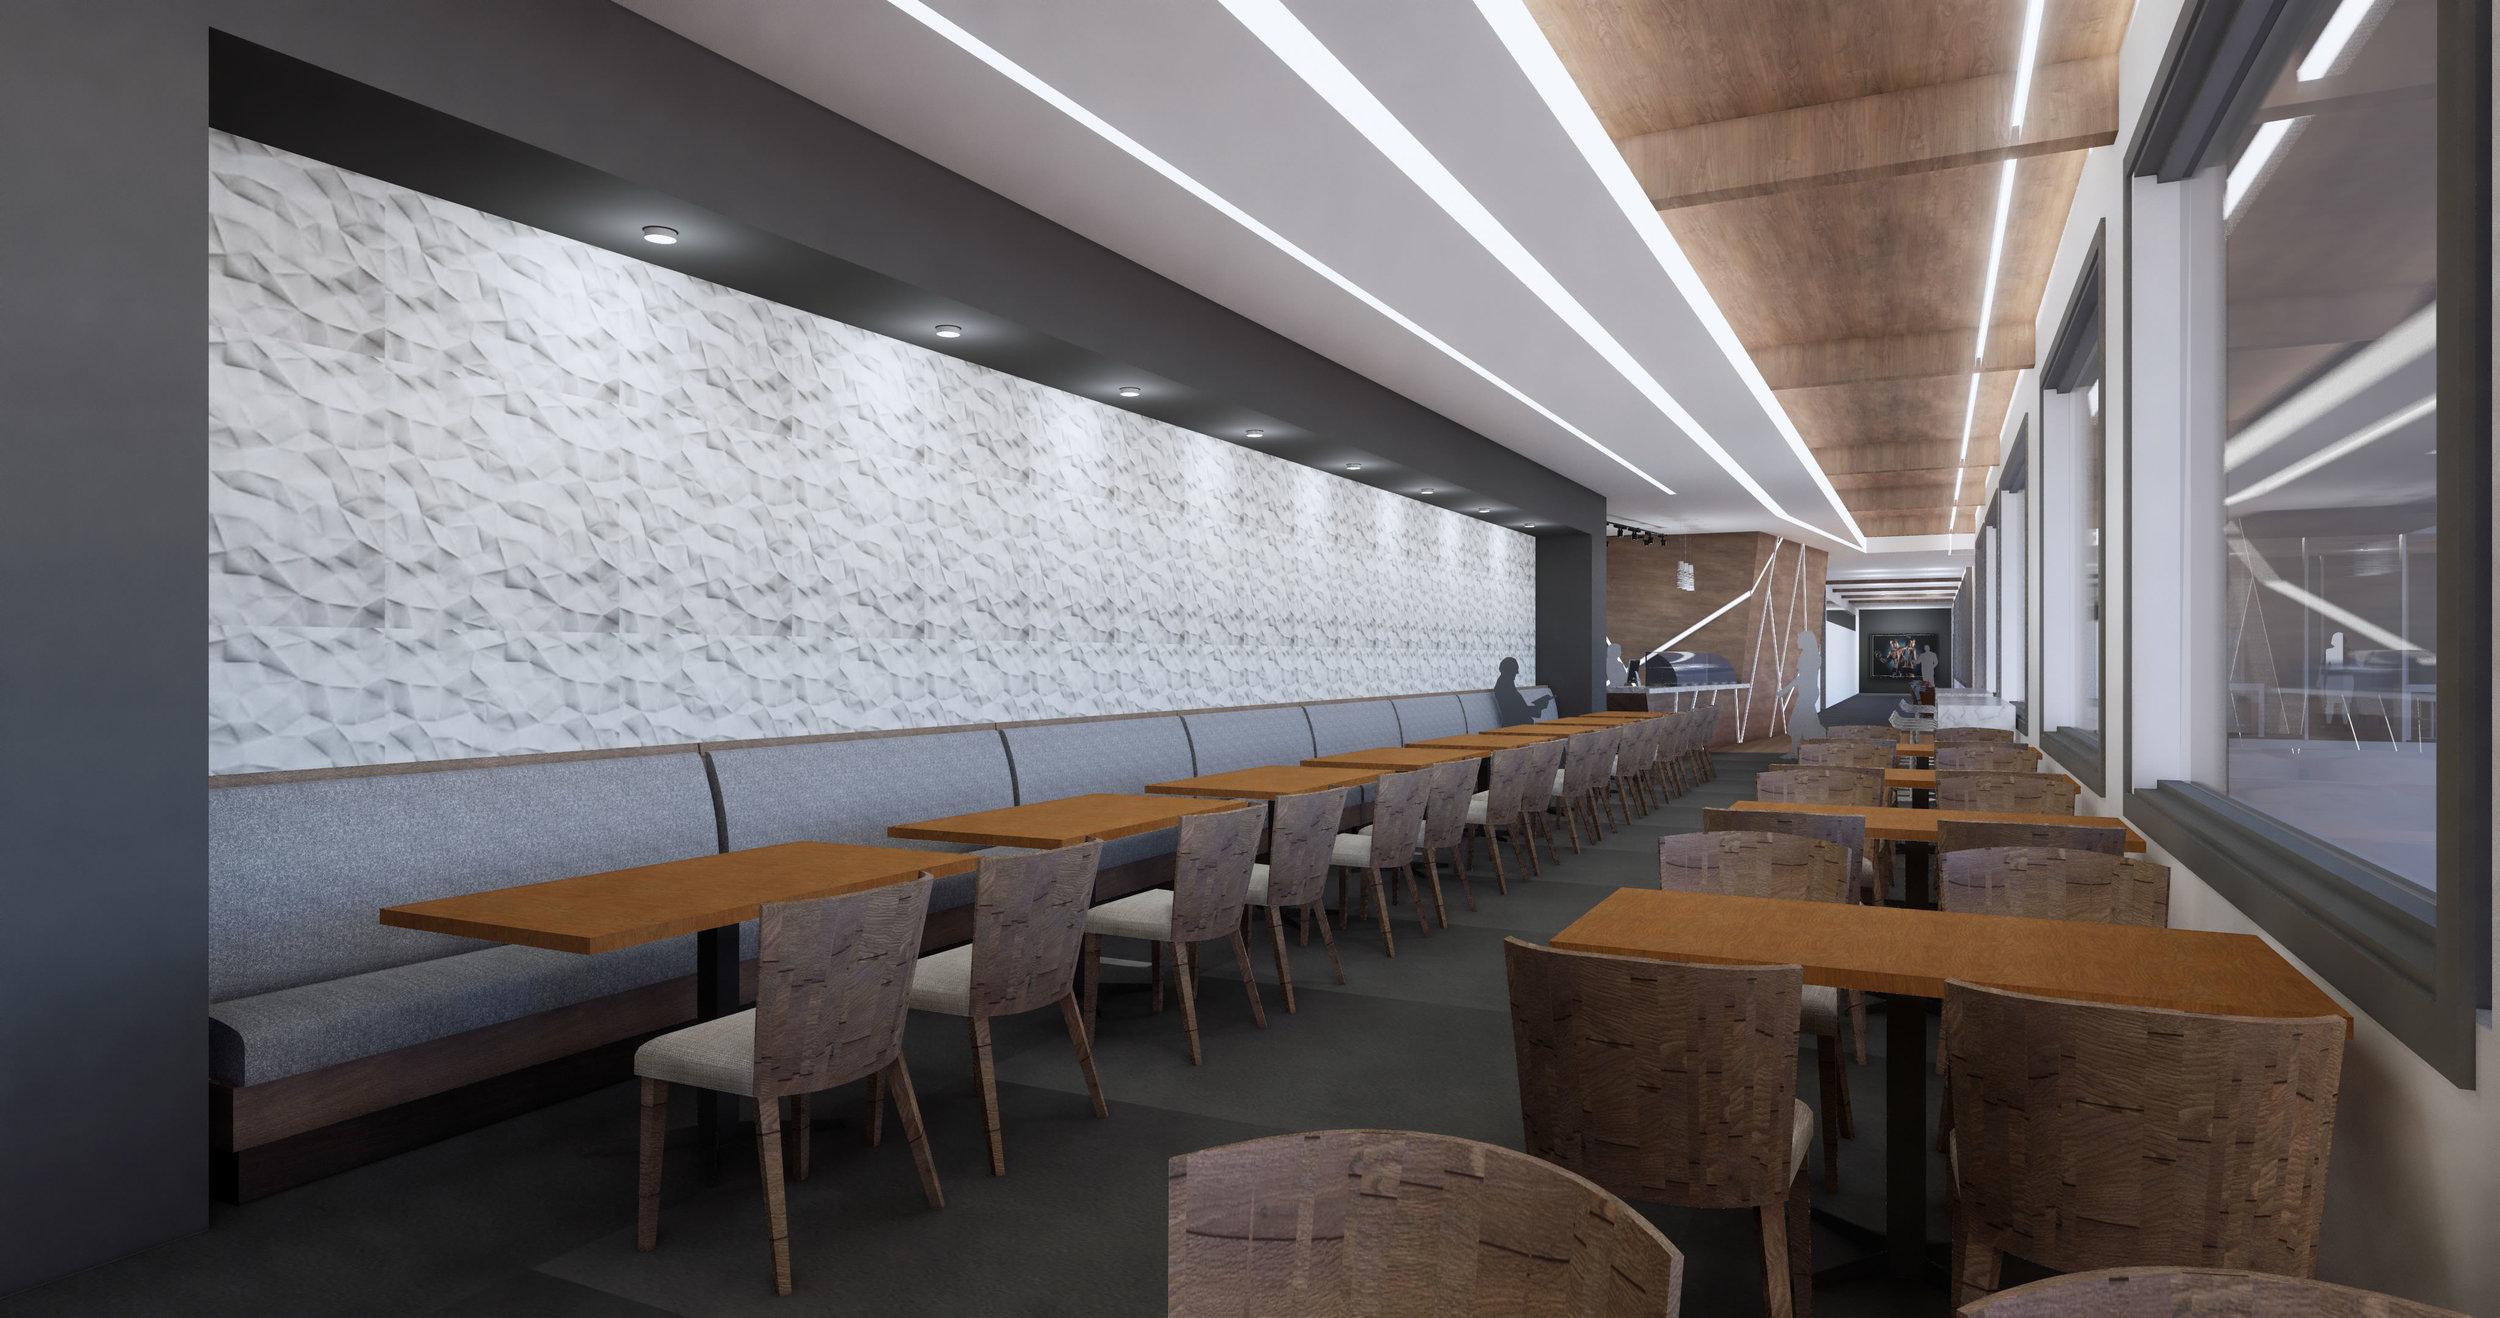 SECOND FLOOR CAFE VIEW 1.jpg